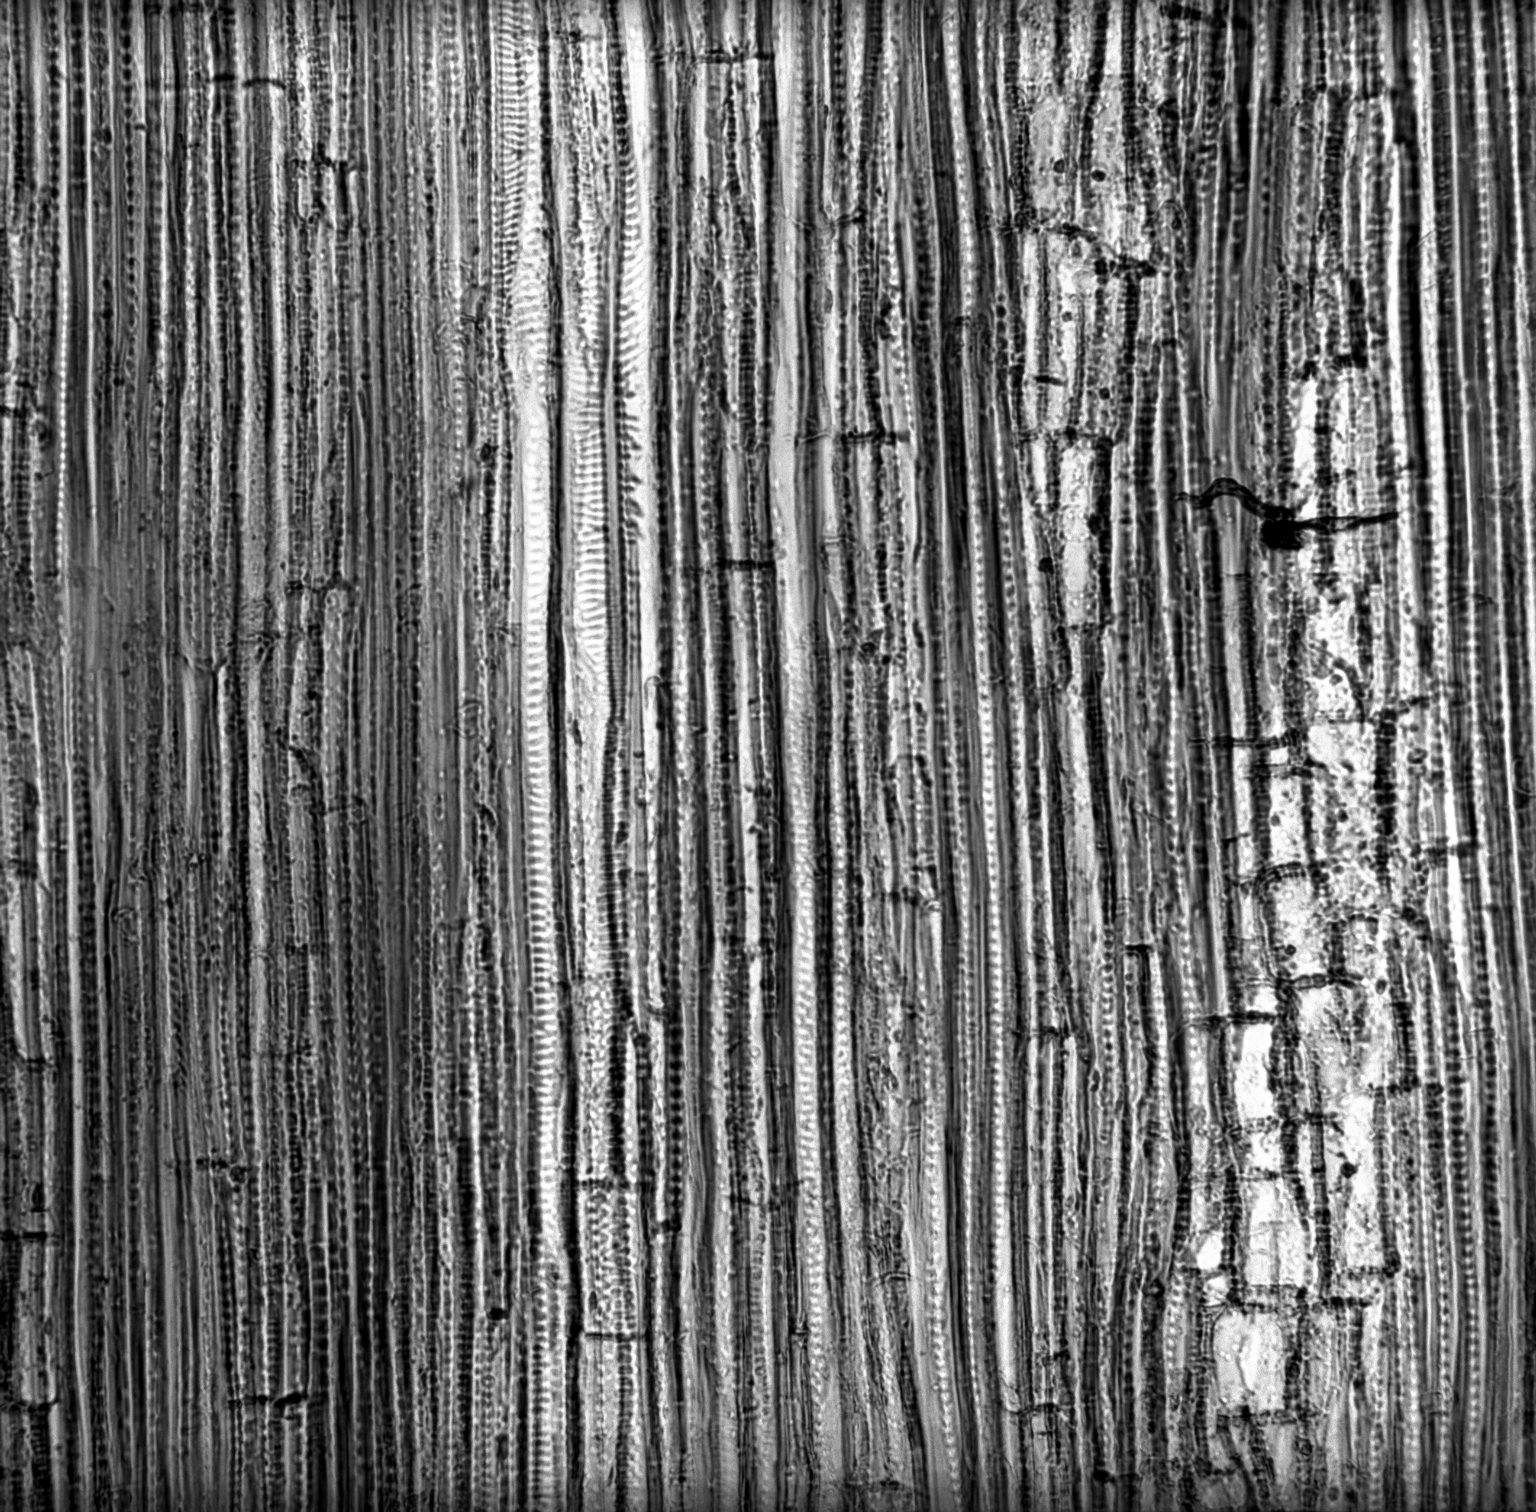 CHLORANTHACEAE Sarcandra glabra